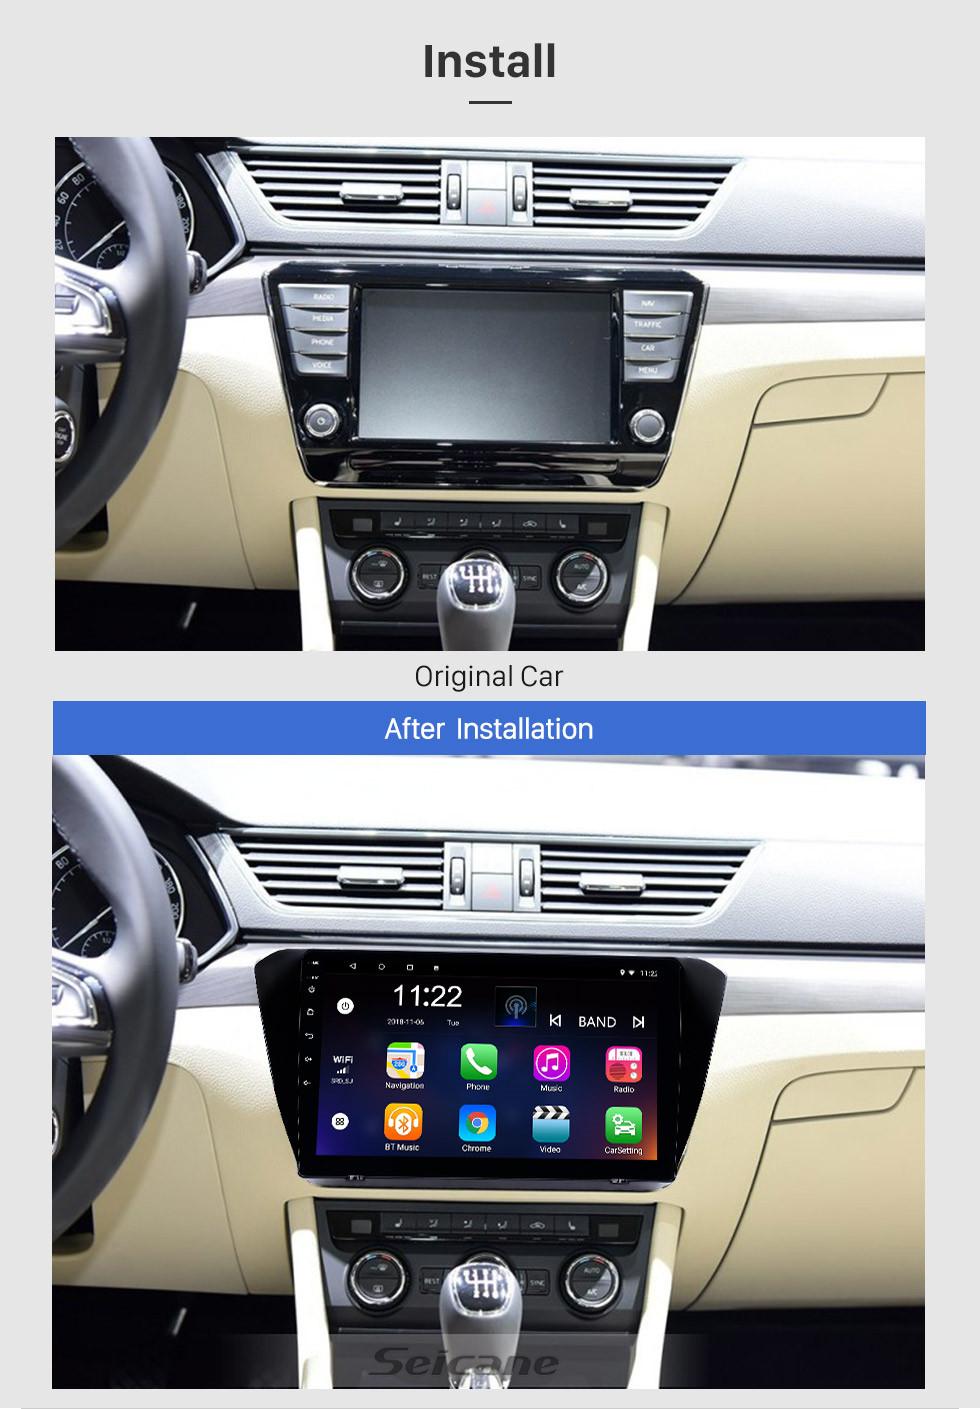 Seicane 10,1 Zoll Android 10.0 GPS Navigationsradio für 2015-2018 Skoda Superb mit HD Touchscreen Bluetooth USB AUX Unterstützung Carplay TPMS